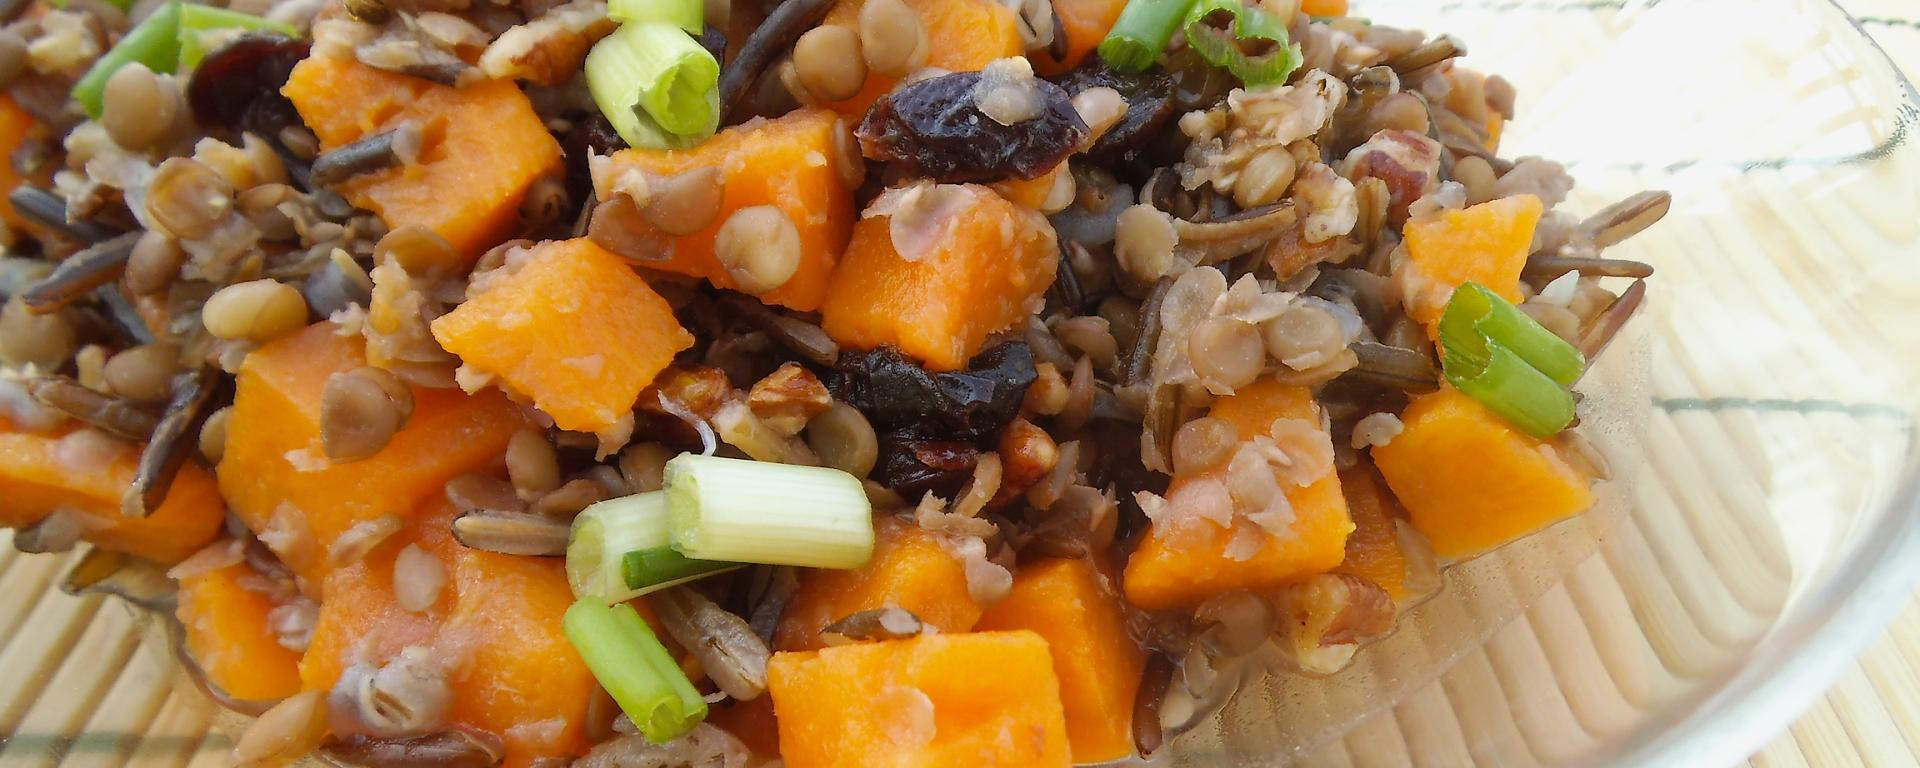 Lentil, Wild Rice, and Sweet Potato Salad with Orange Pecan Dressing